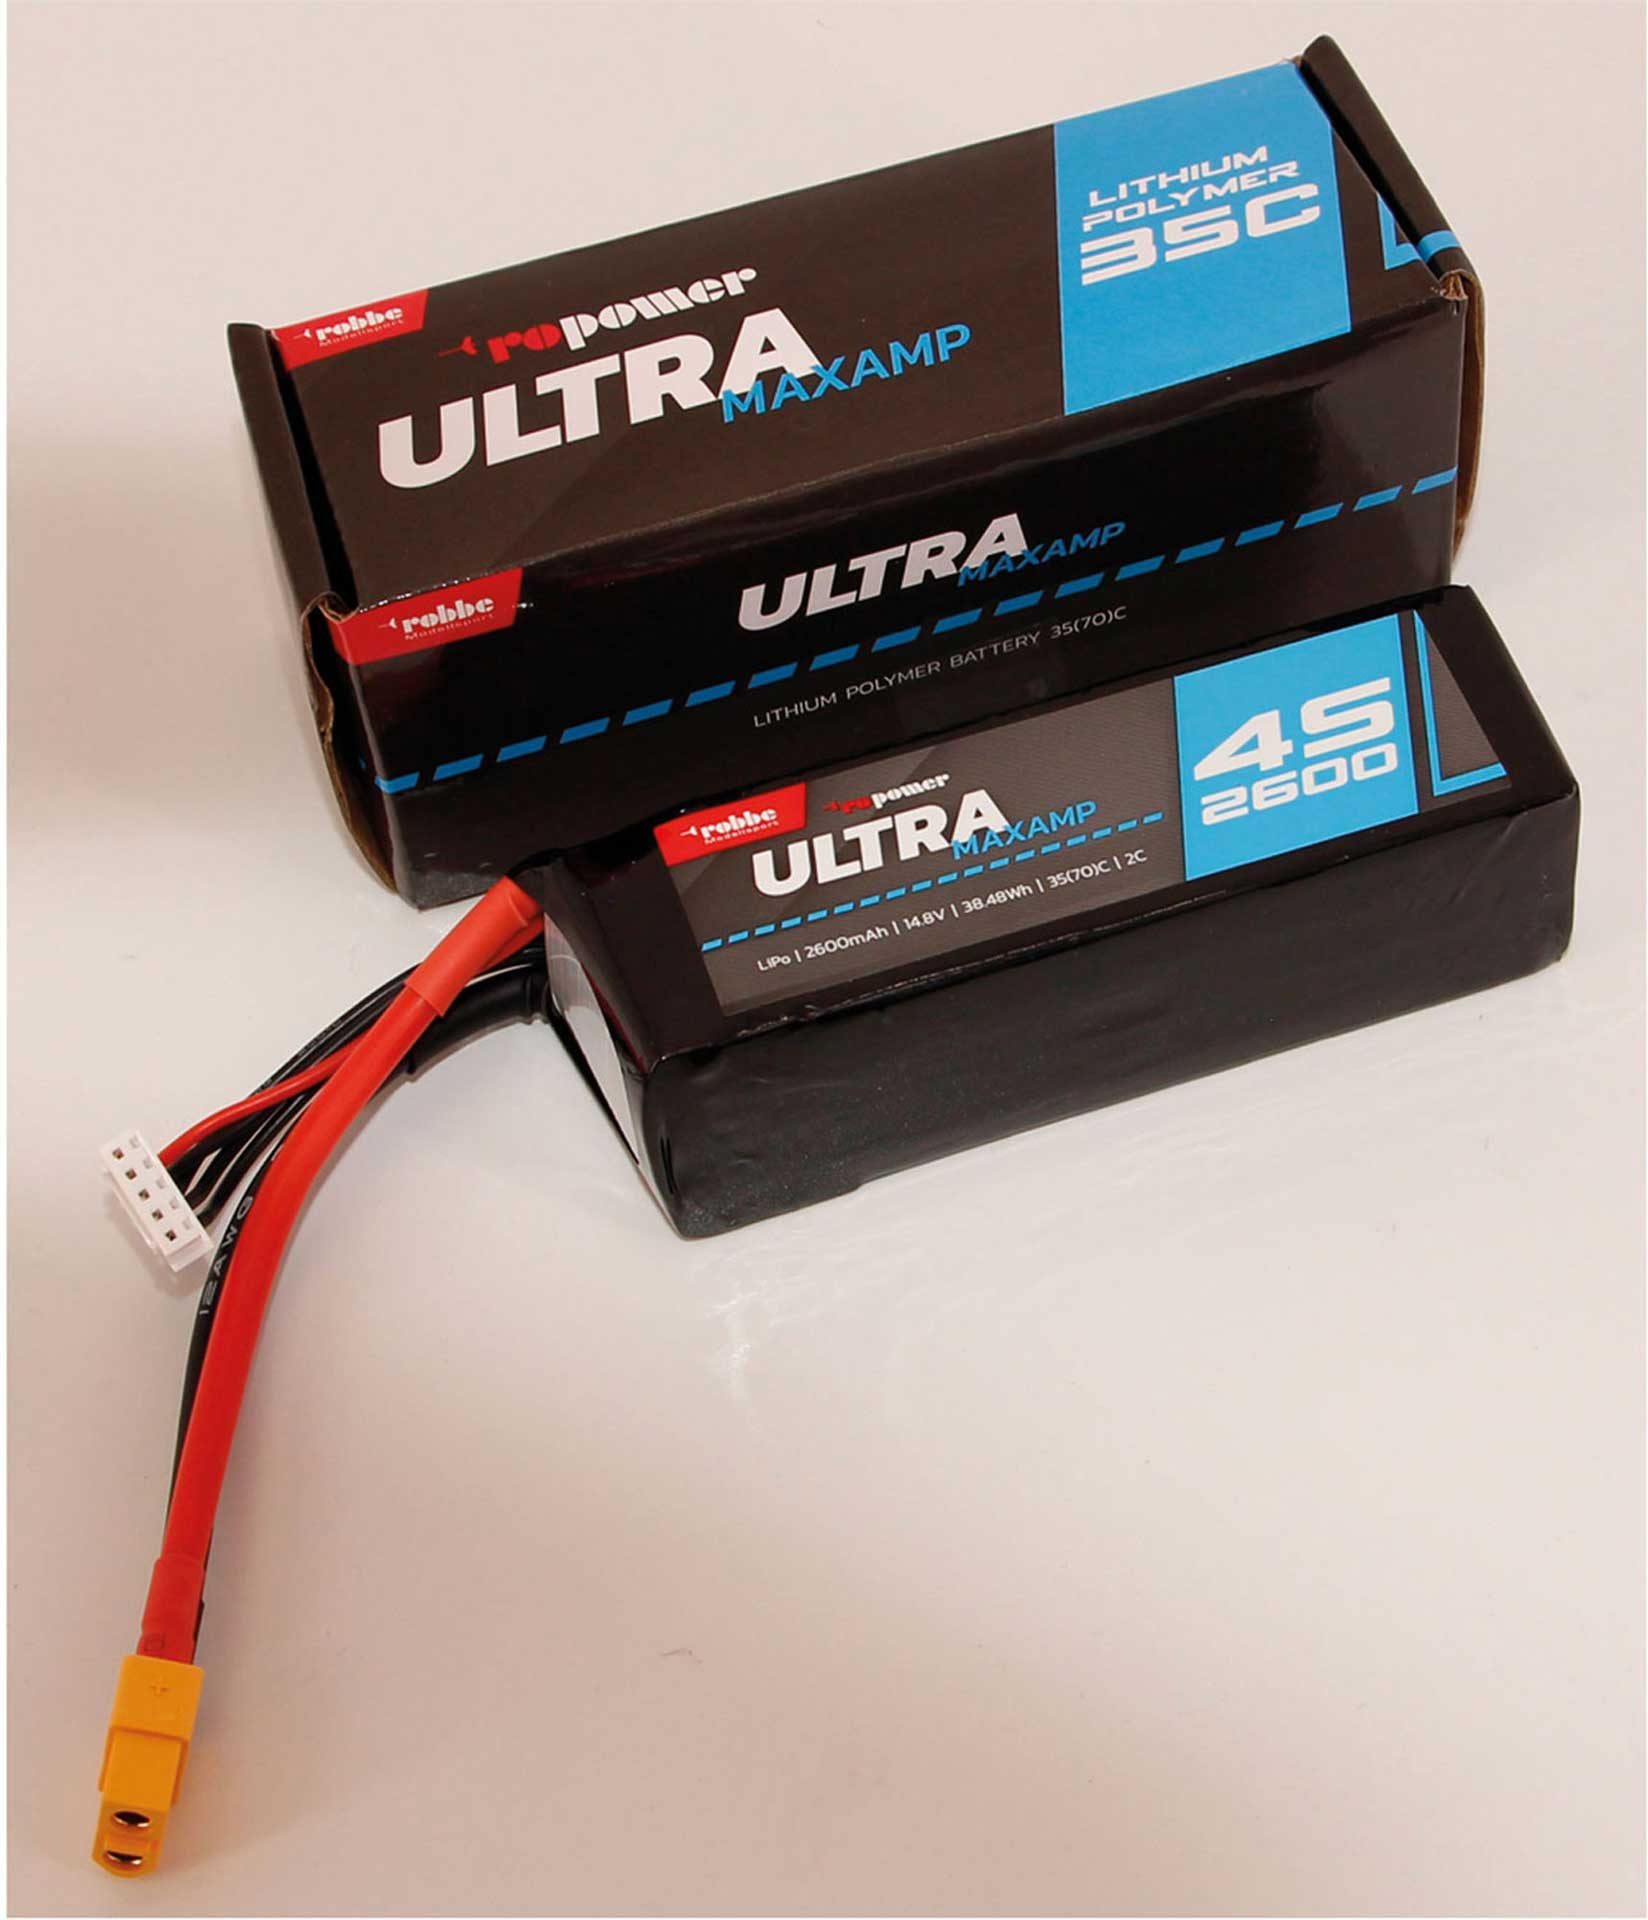 Robbe Modellsport RO-POWER ULTRA MAXAMP 2600MAH 14,8 VOLT 4S 35(70)C LIPO AKKU